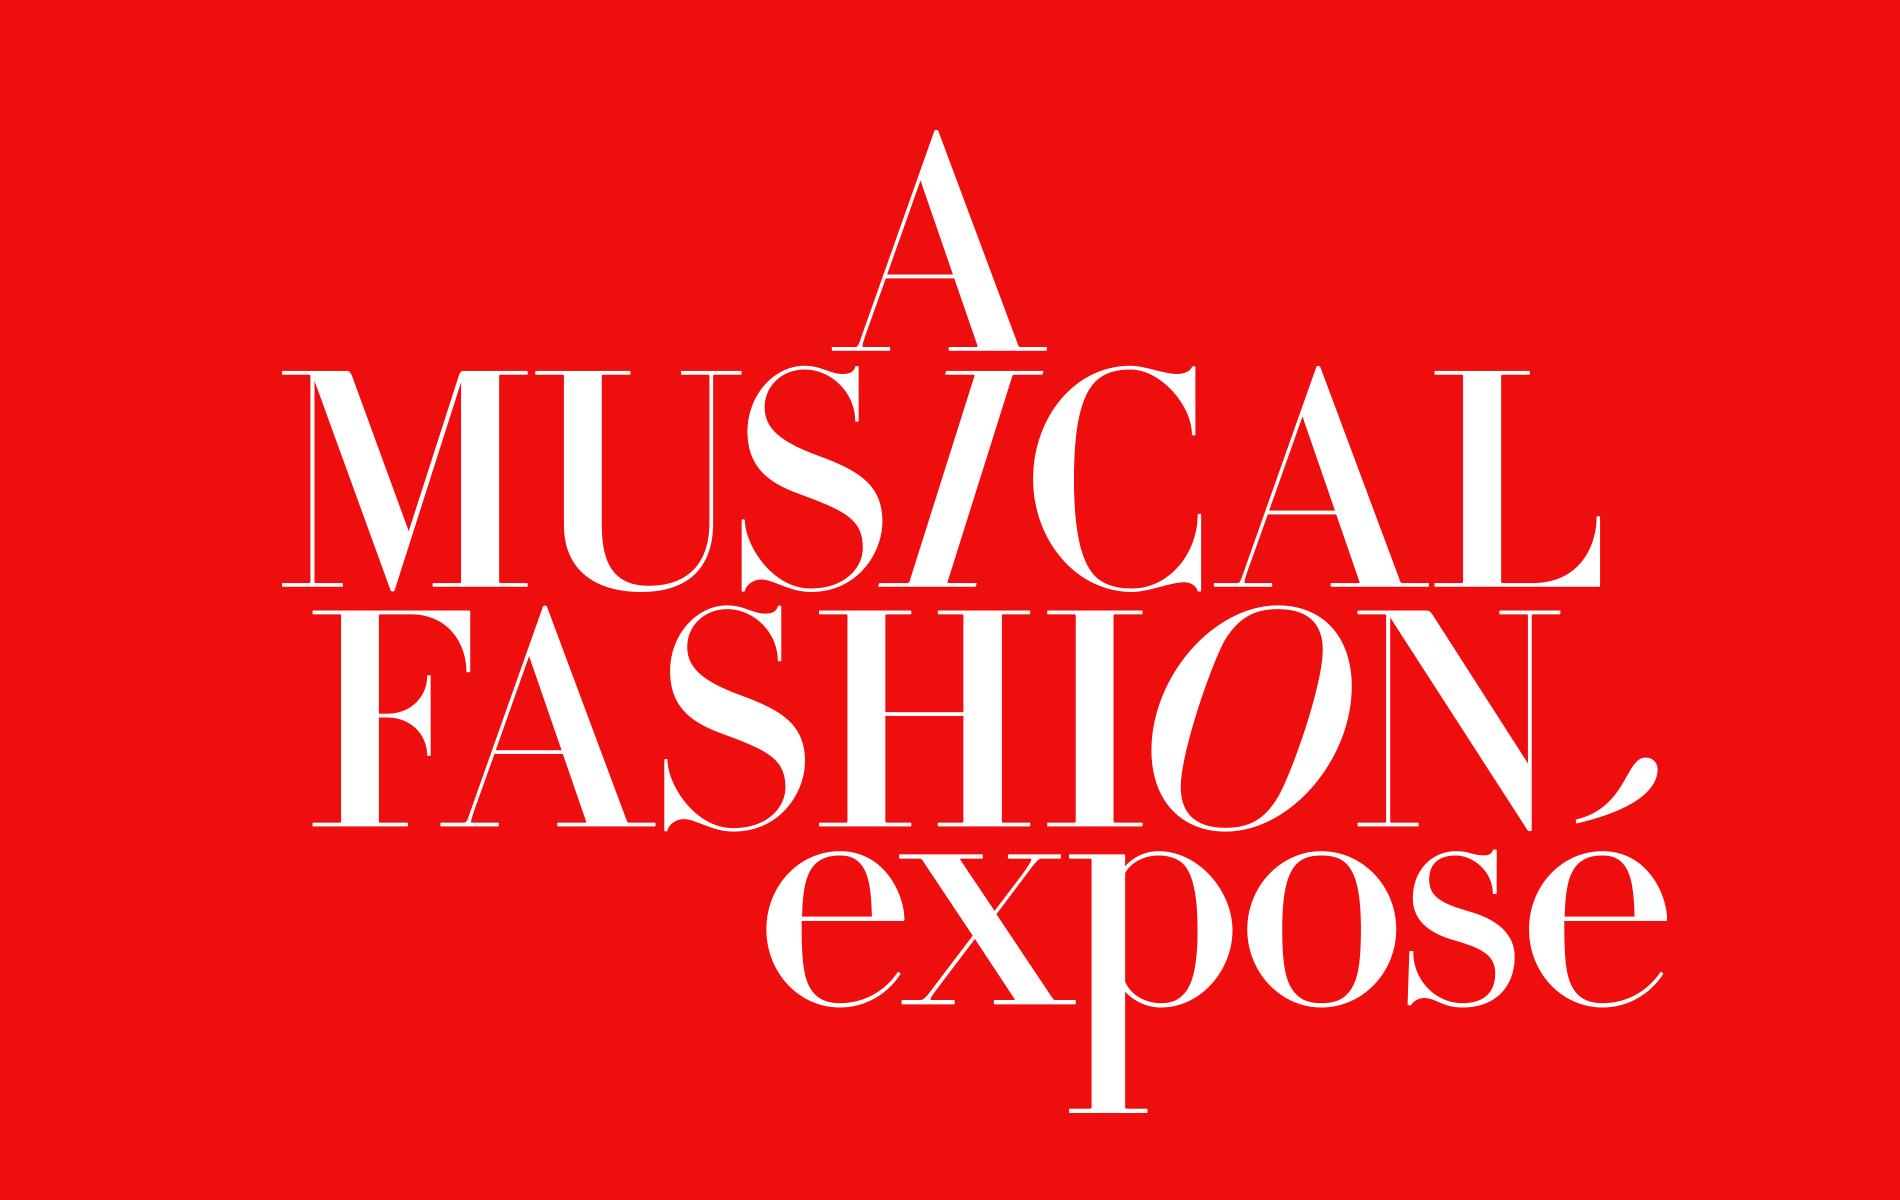 A musical fashion expose